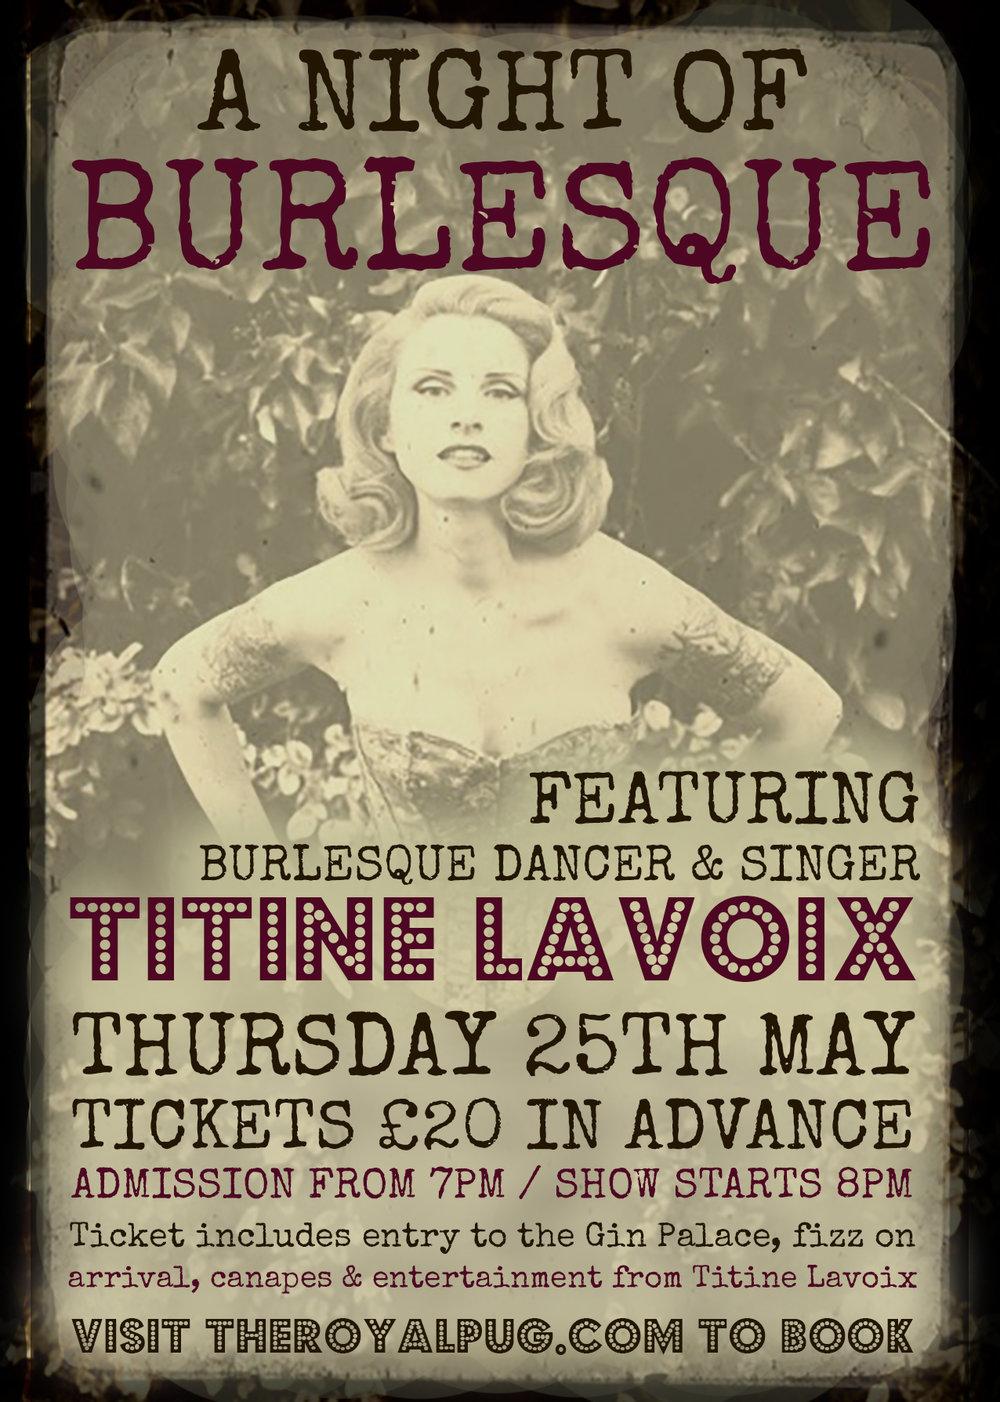 burlesque may print.jpg